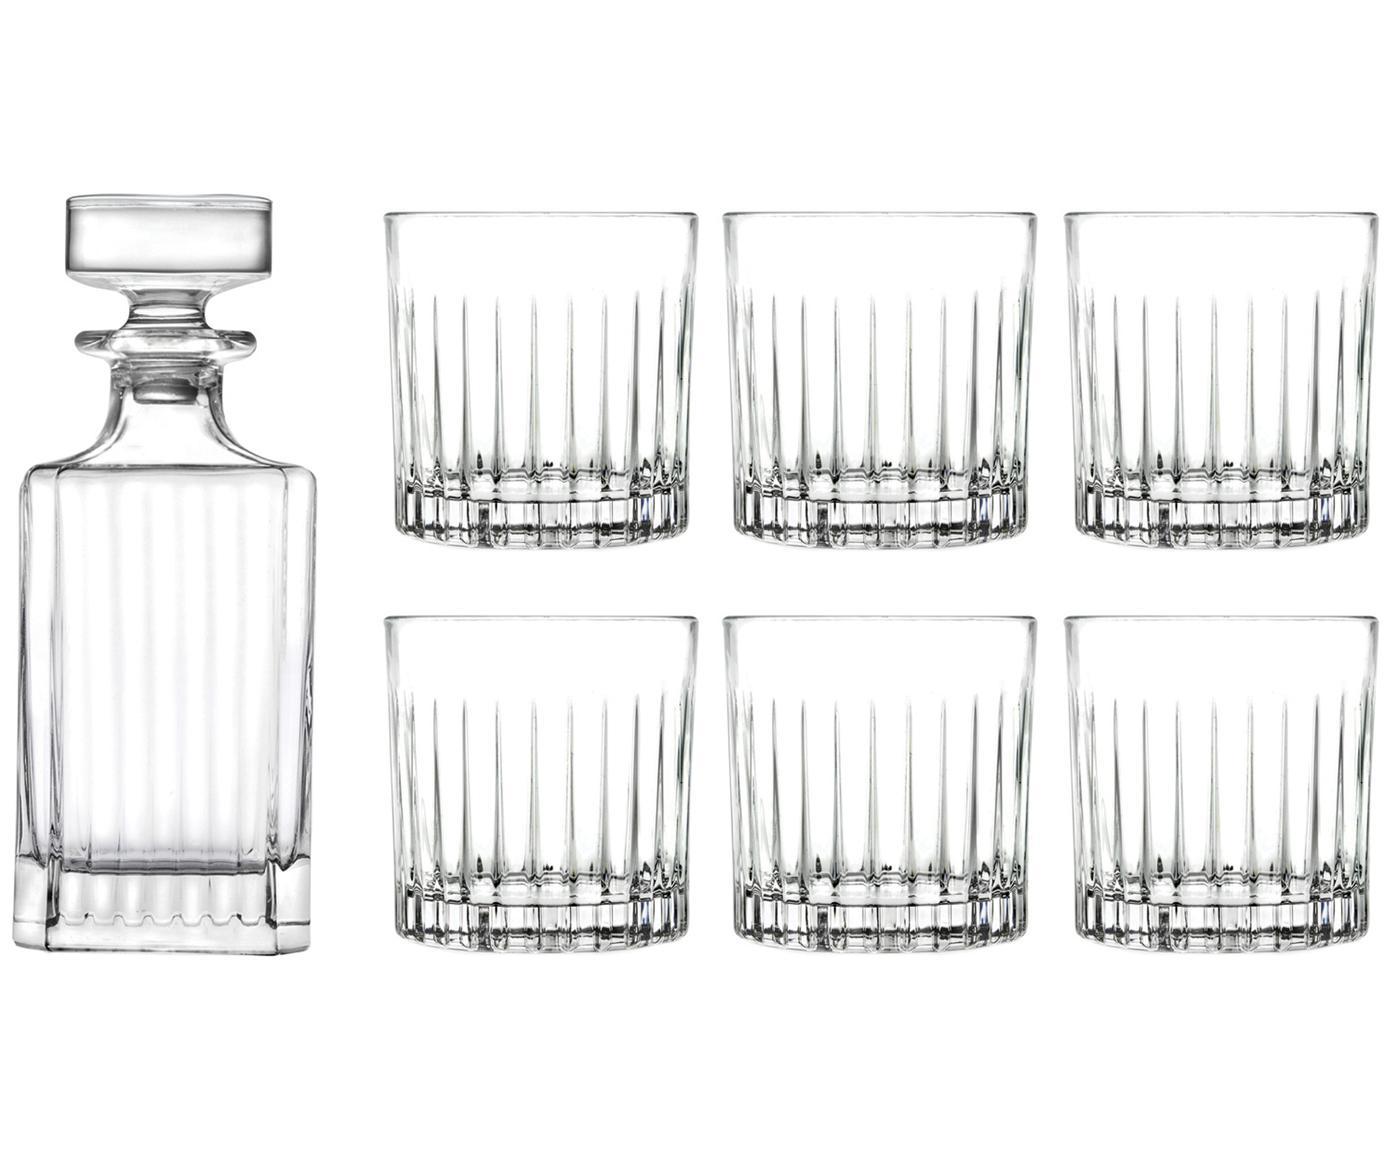 Kristall-Whiskey-Set Timeless, 7-tlg., Kristallglas, Transparent, Sondergrößen